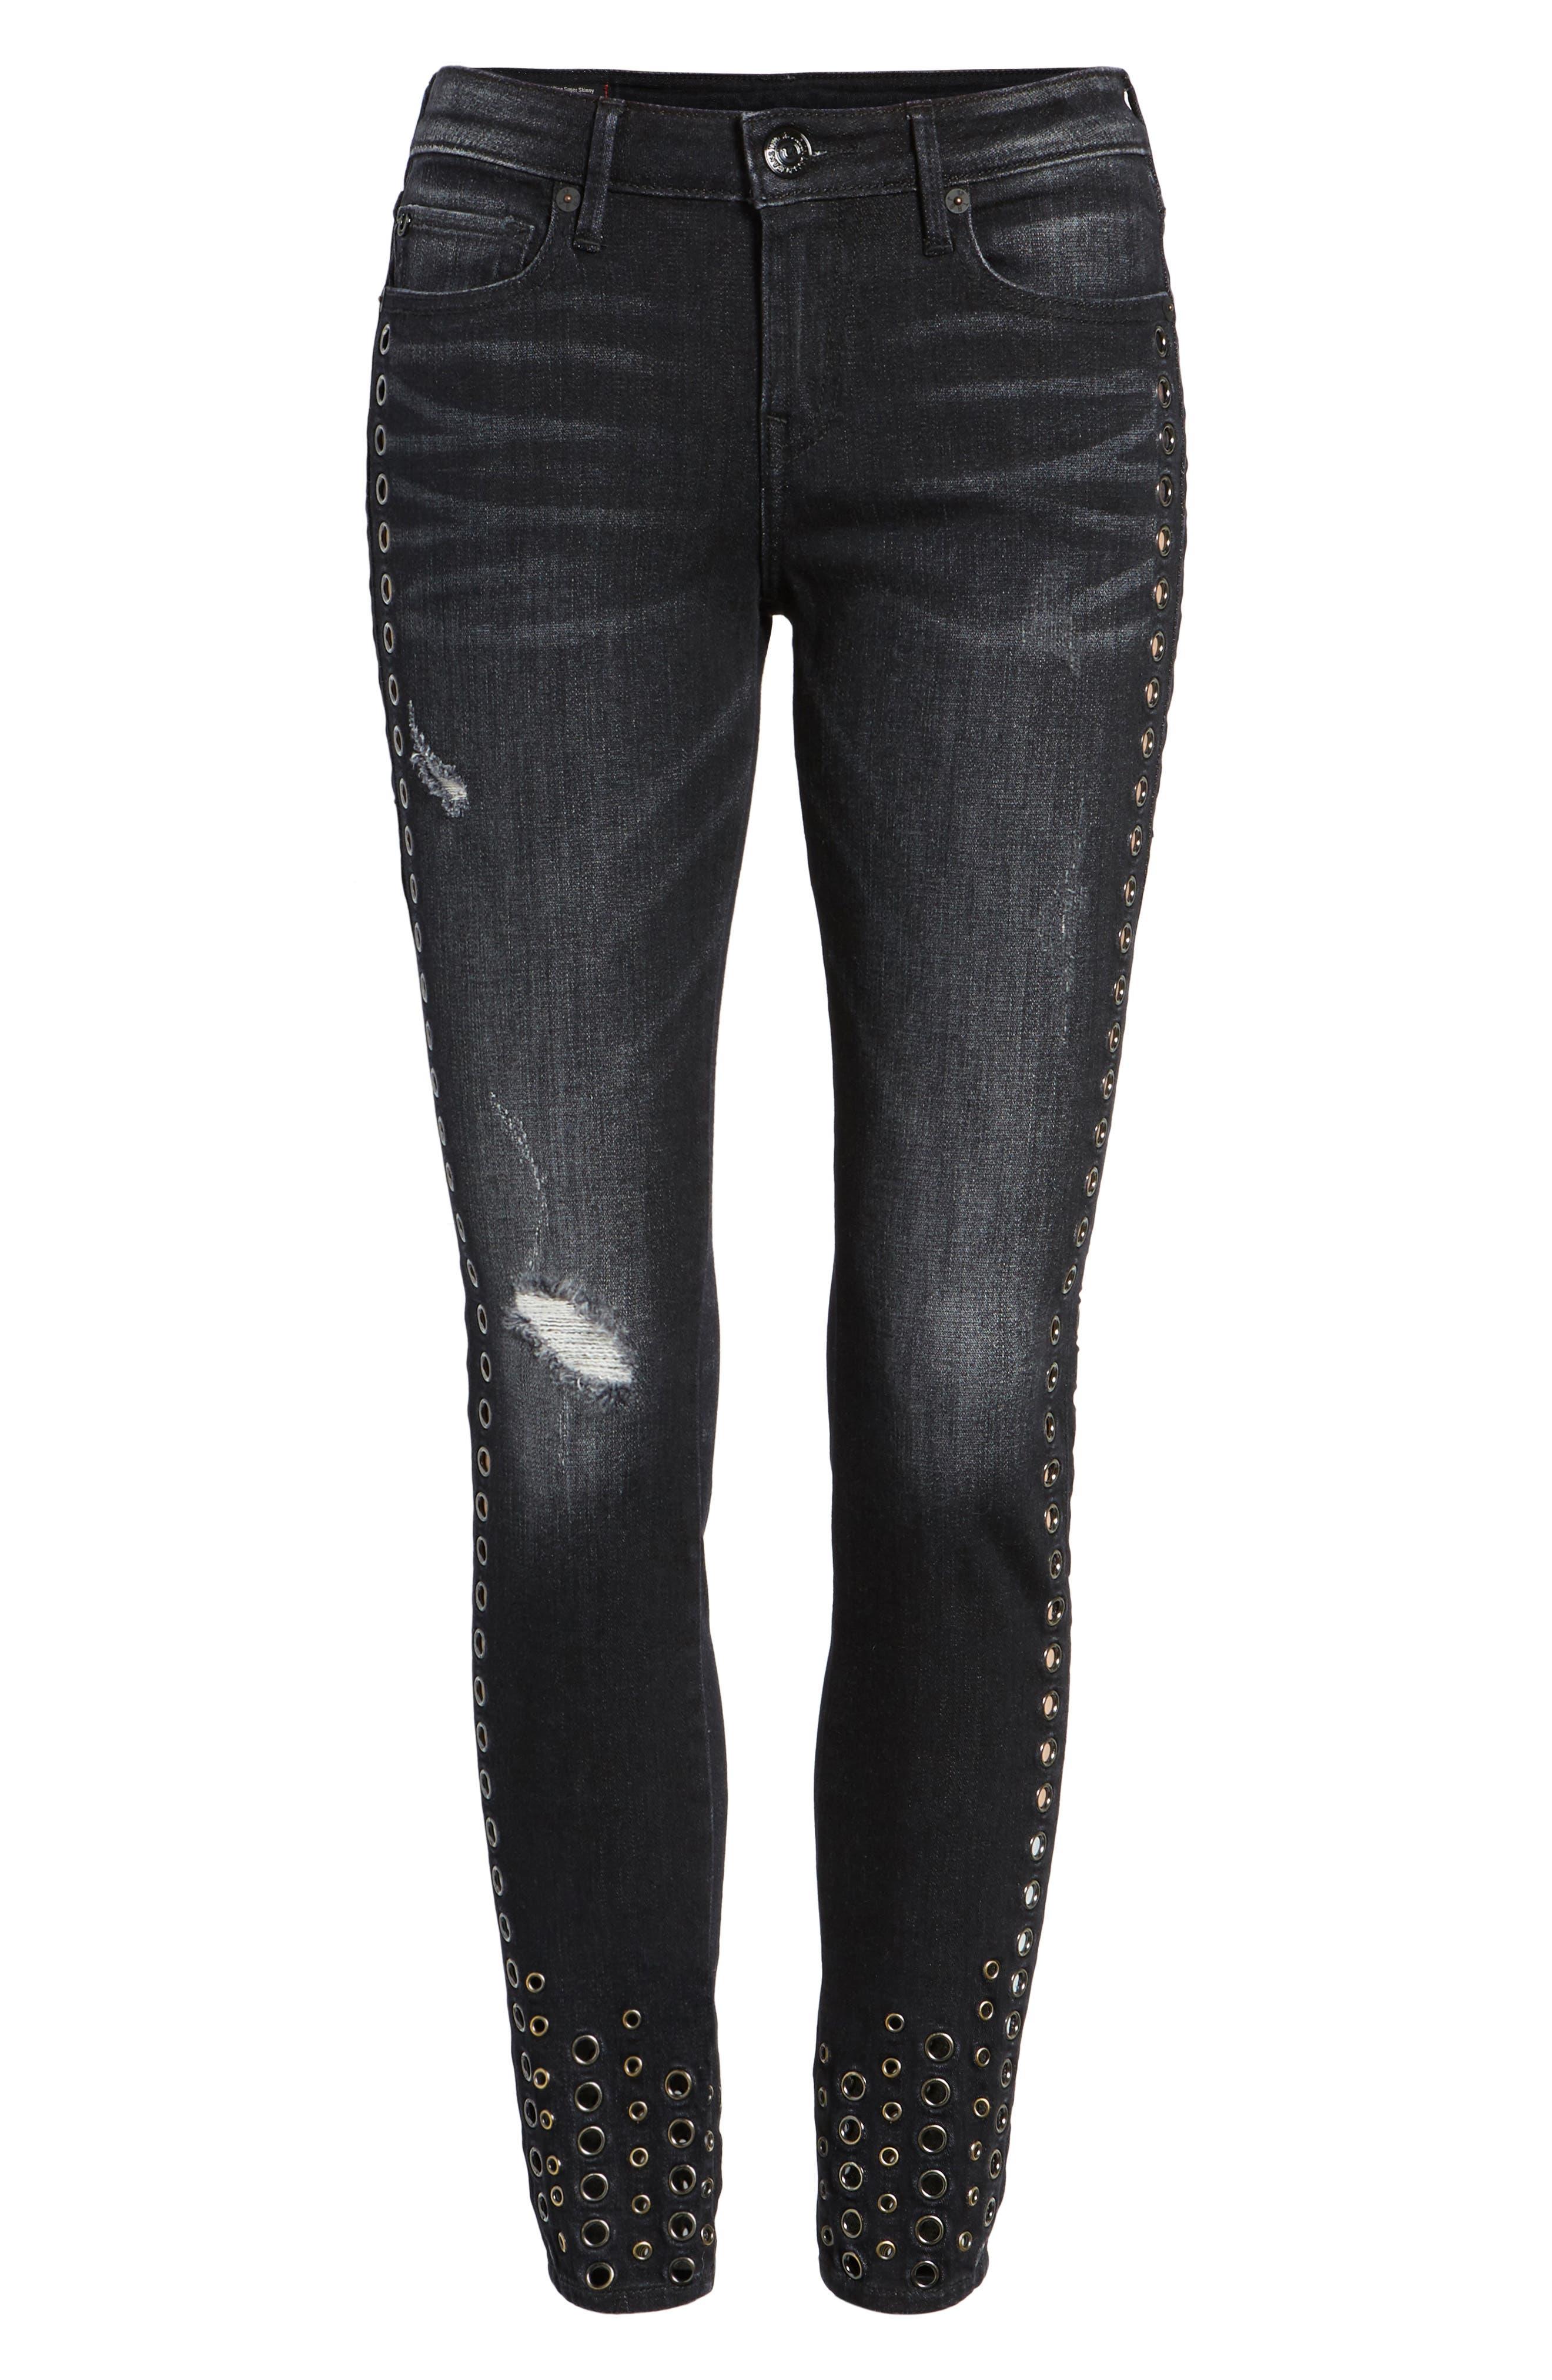 Halle Ankle Super Skinny Jeans,                             Alternate thumbnail 6, color,                             Rock Solid Wash